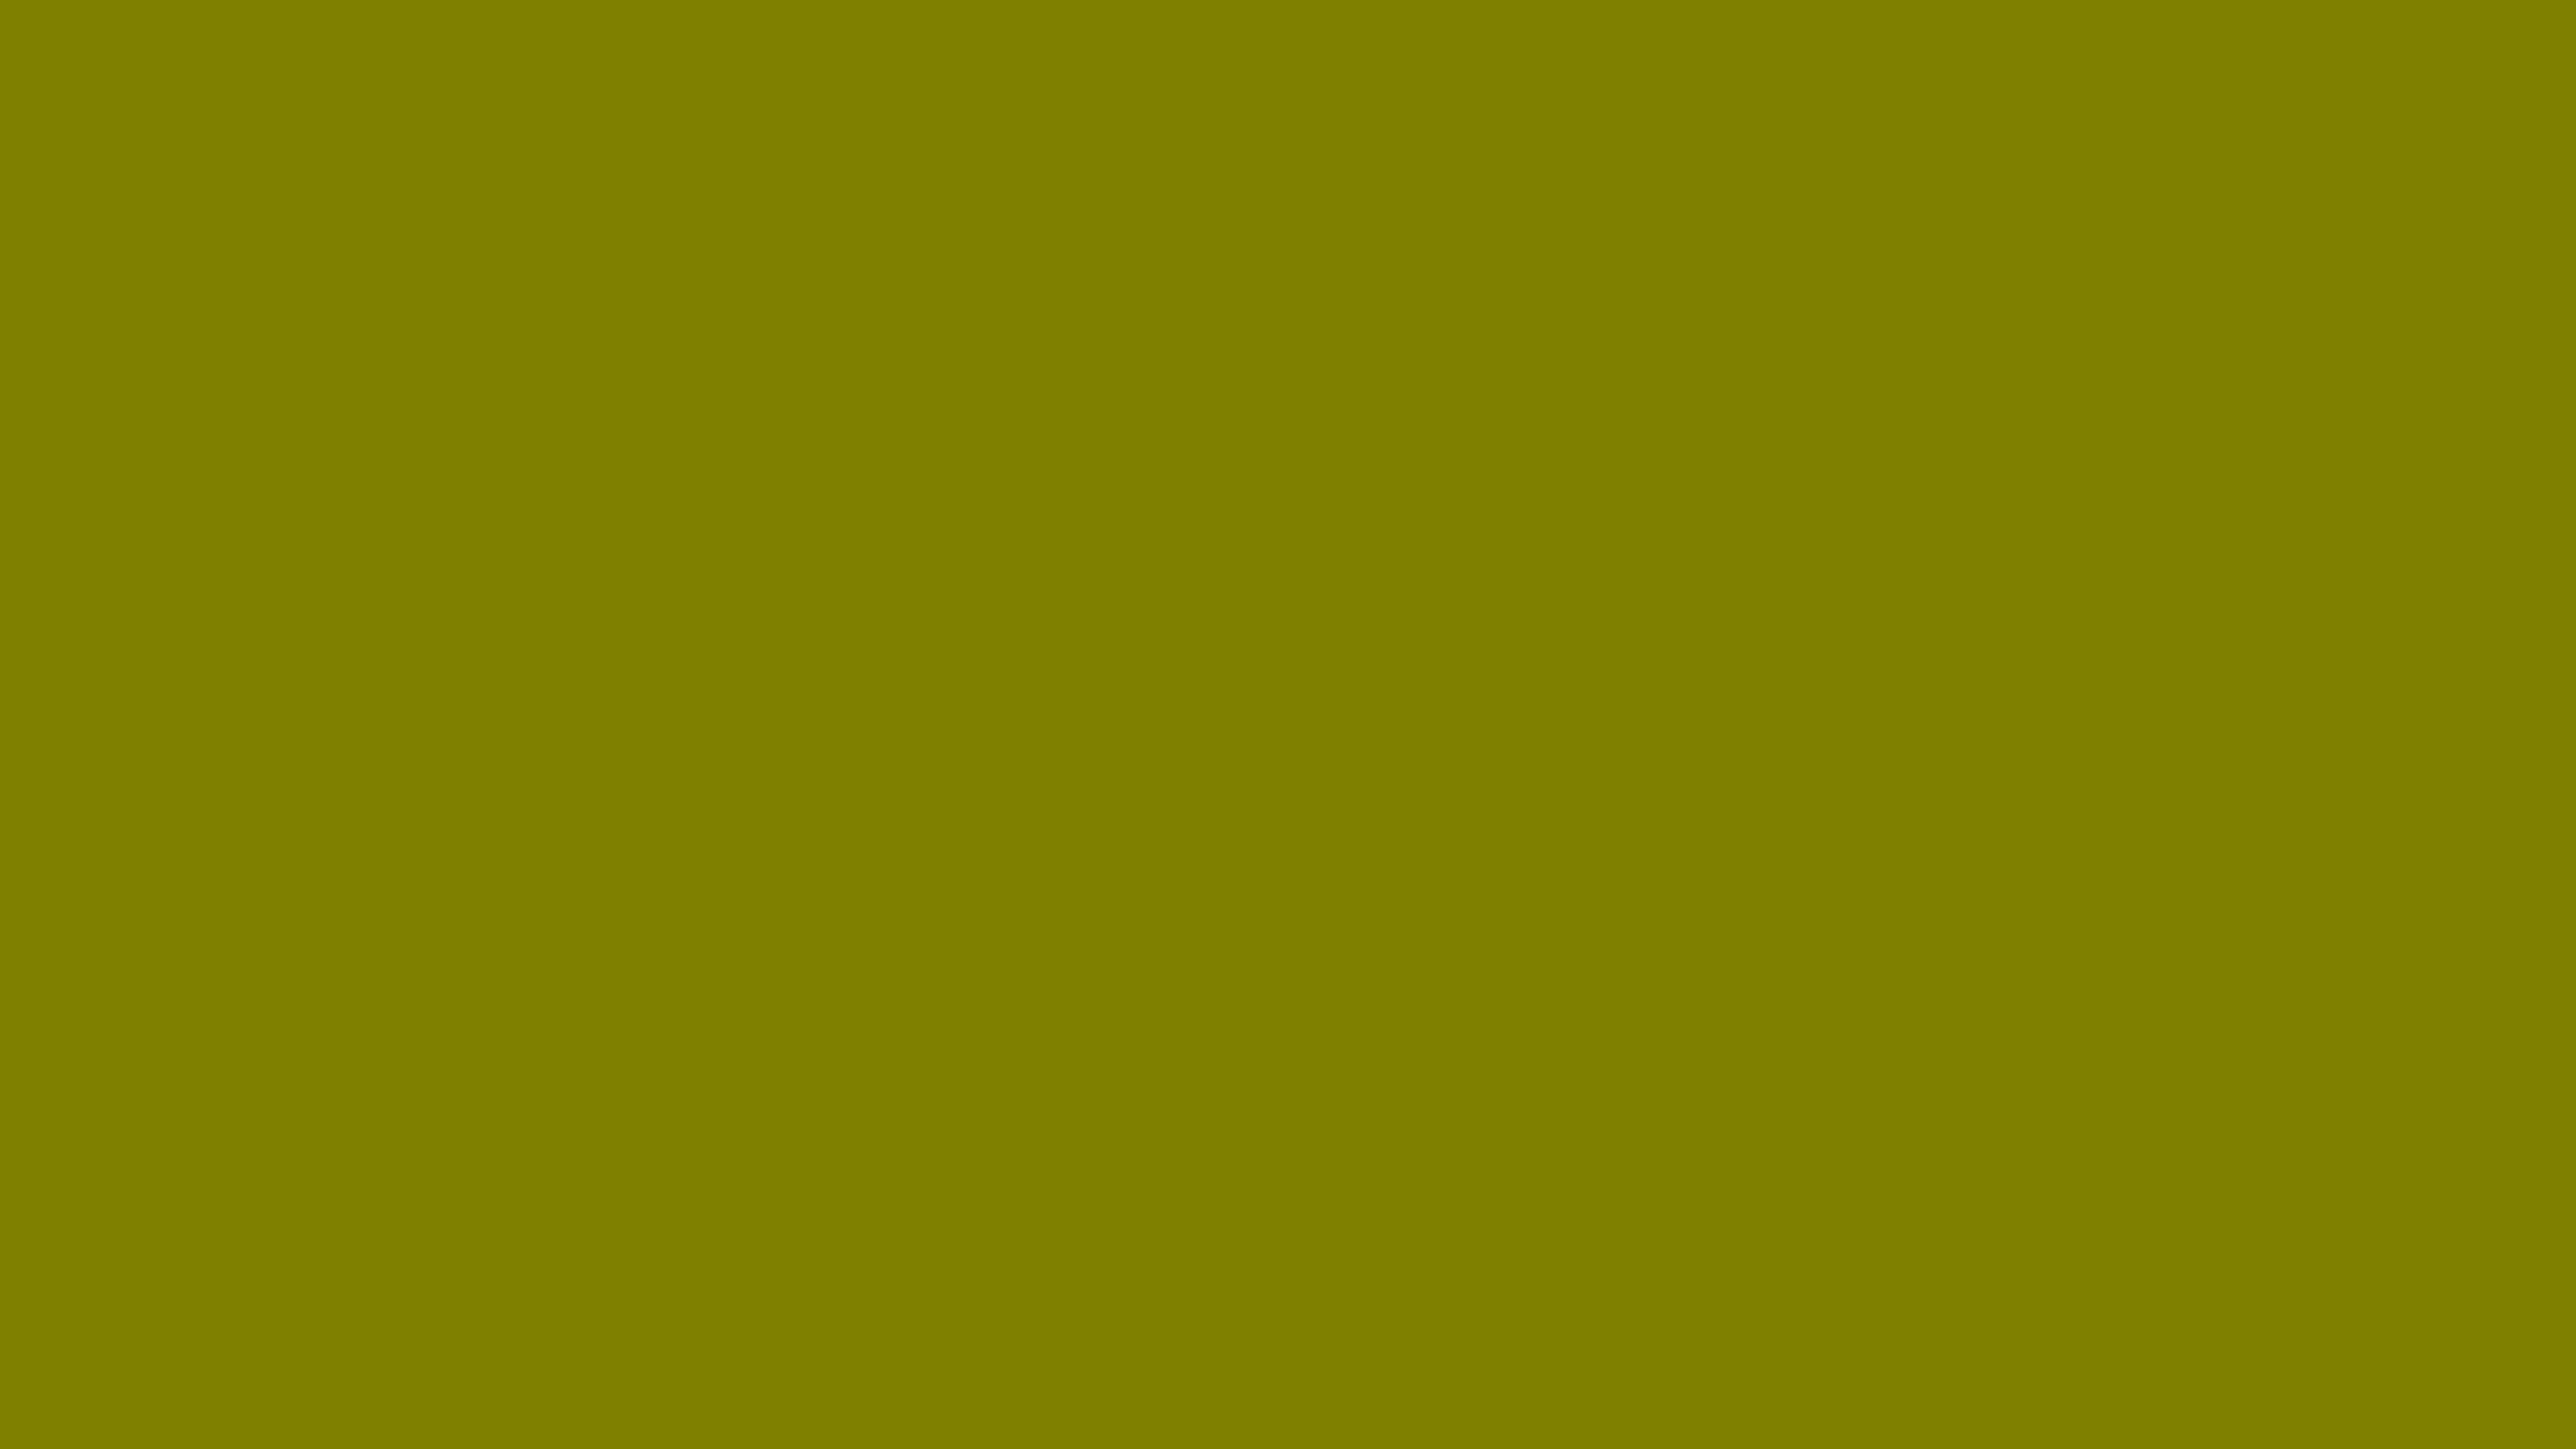 5120x2880 Olive Solid Color Background